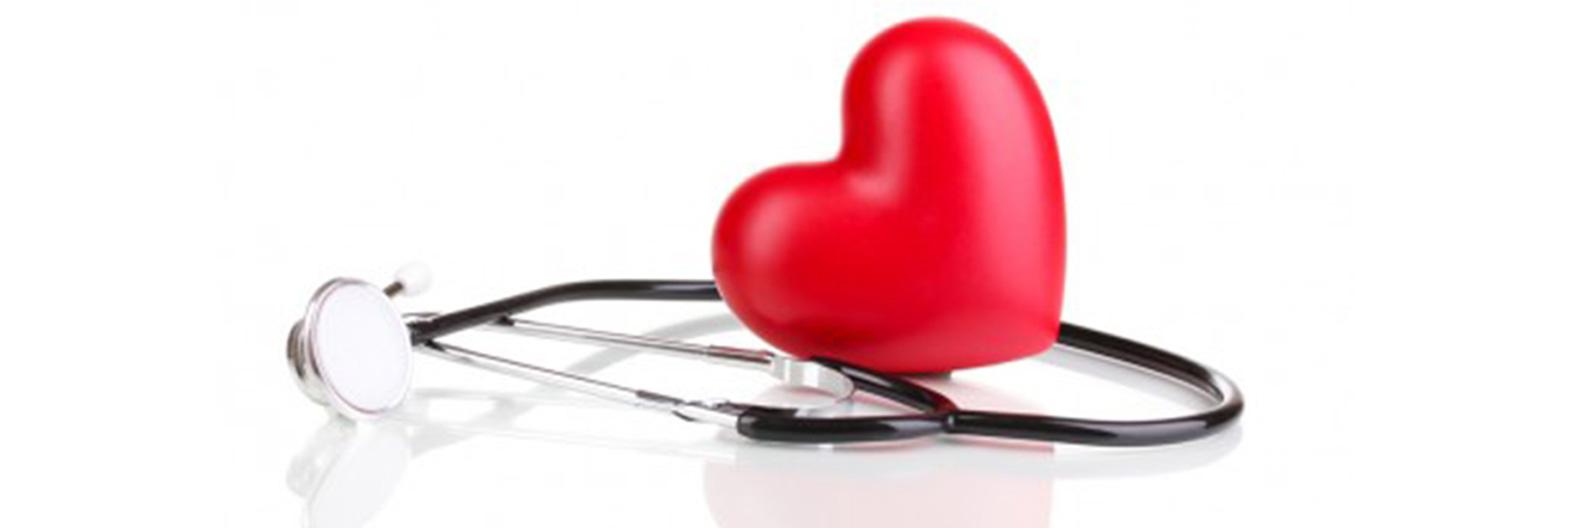 mishustin hipertenzija kaip vartoti hipotiazidą sergant hipertenzija